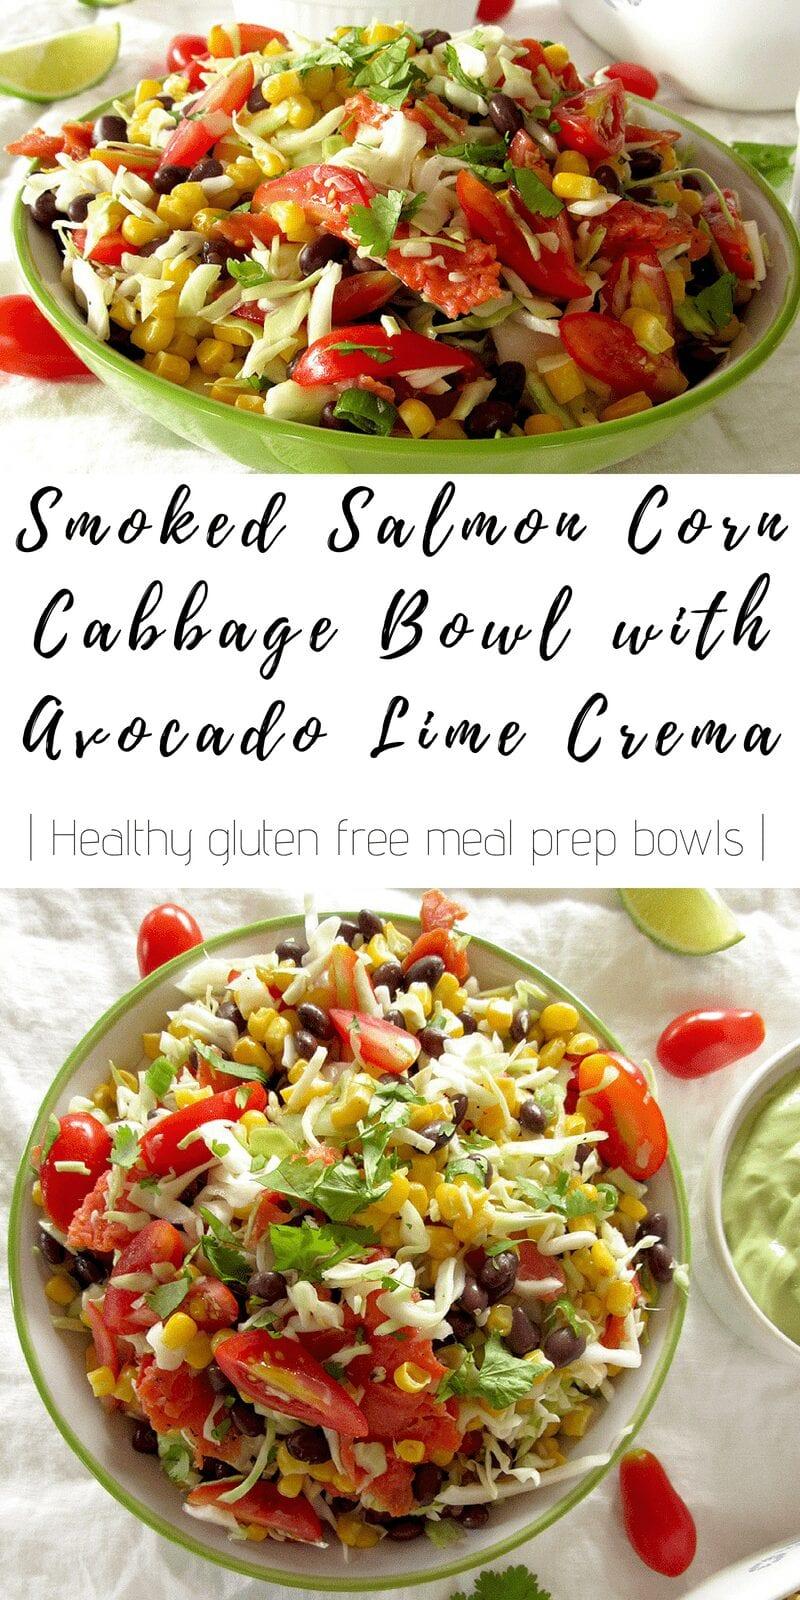 smoked salmon corn cabbage bowl with avocado lime crema